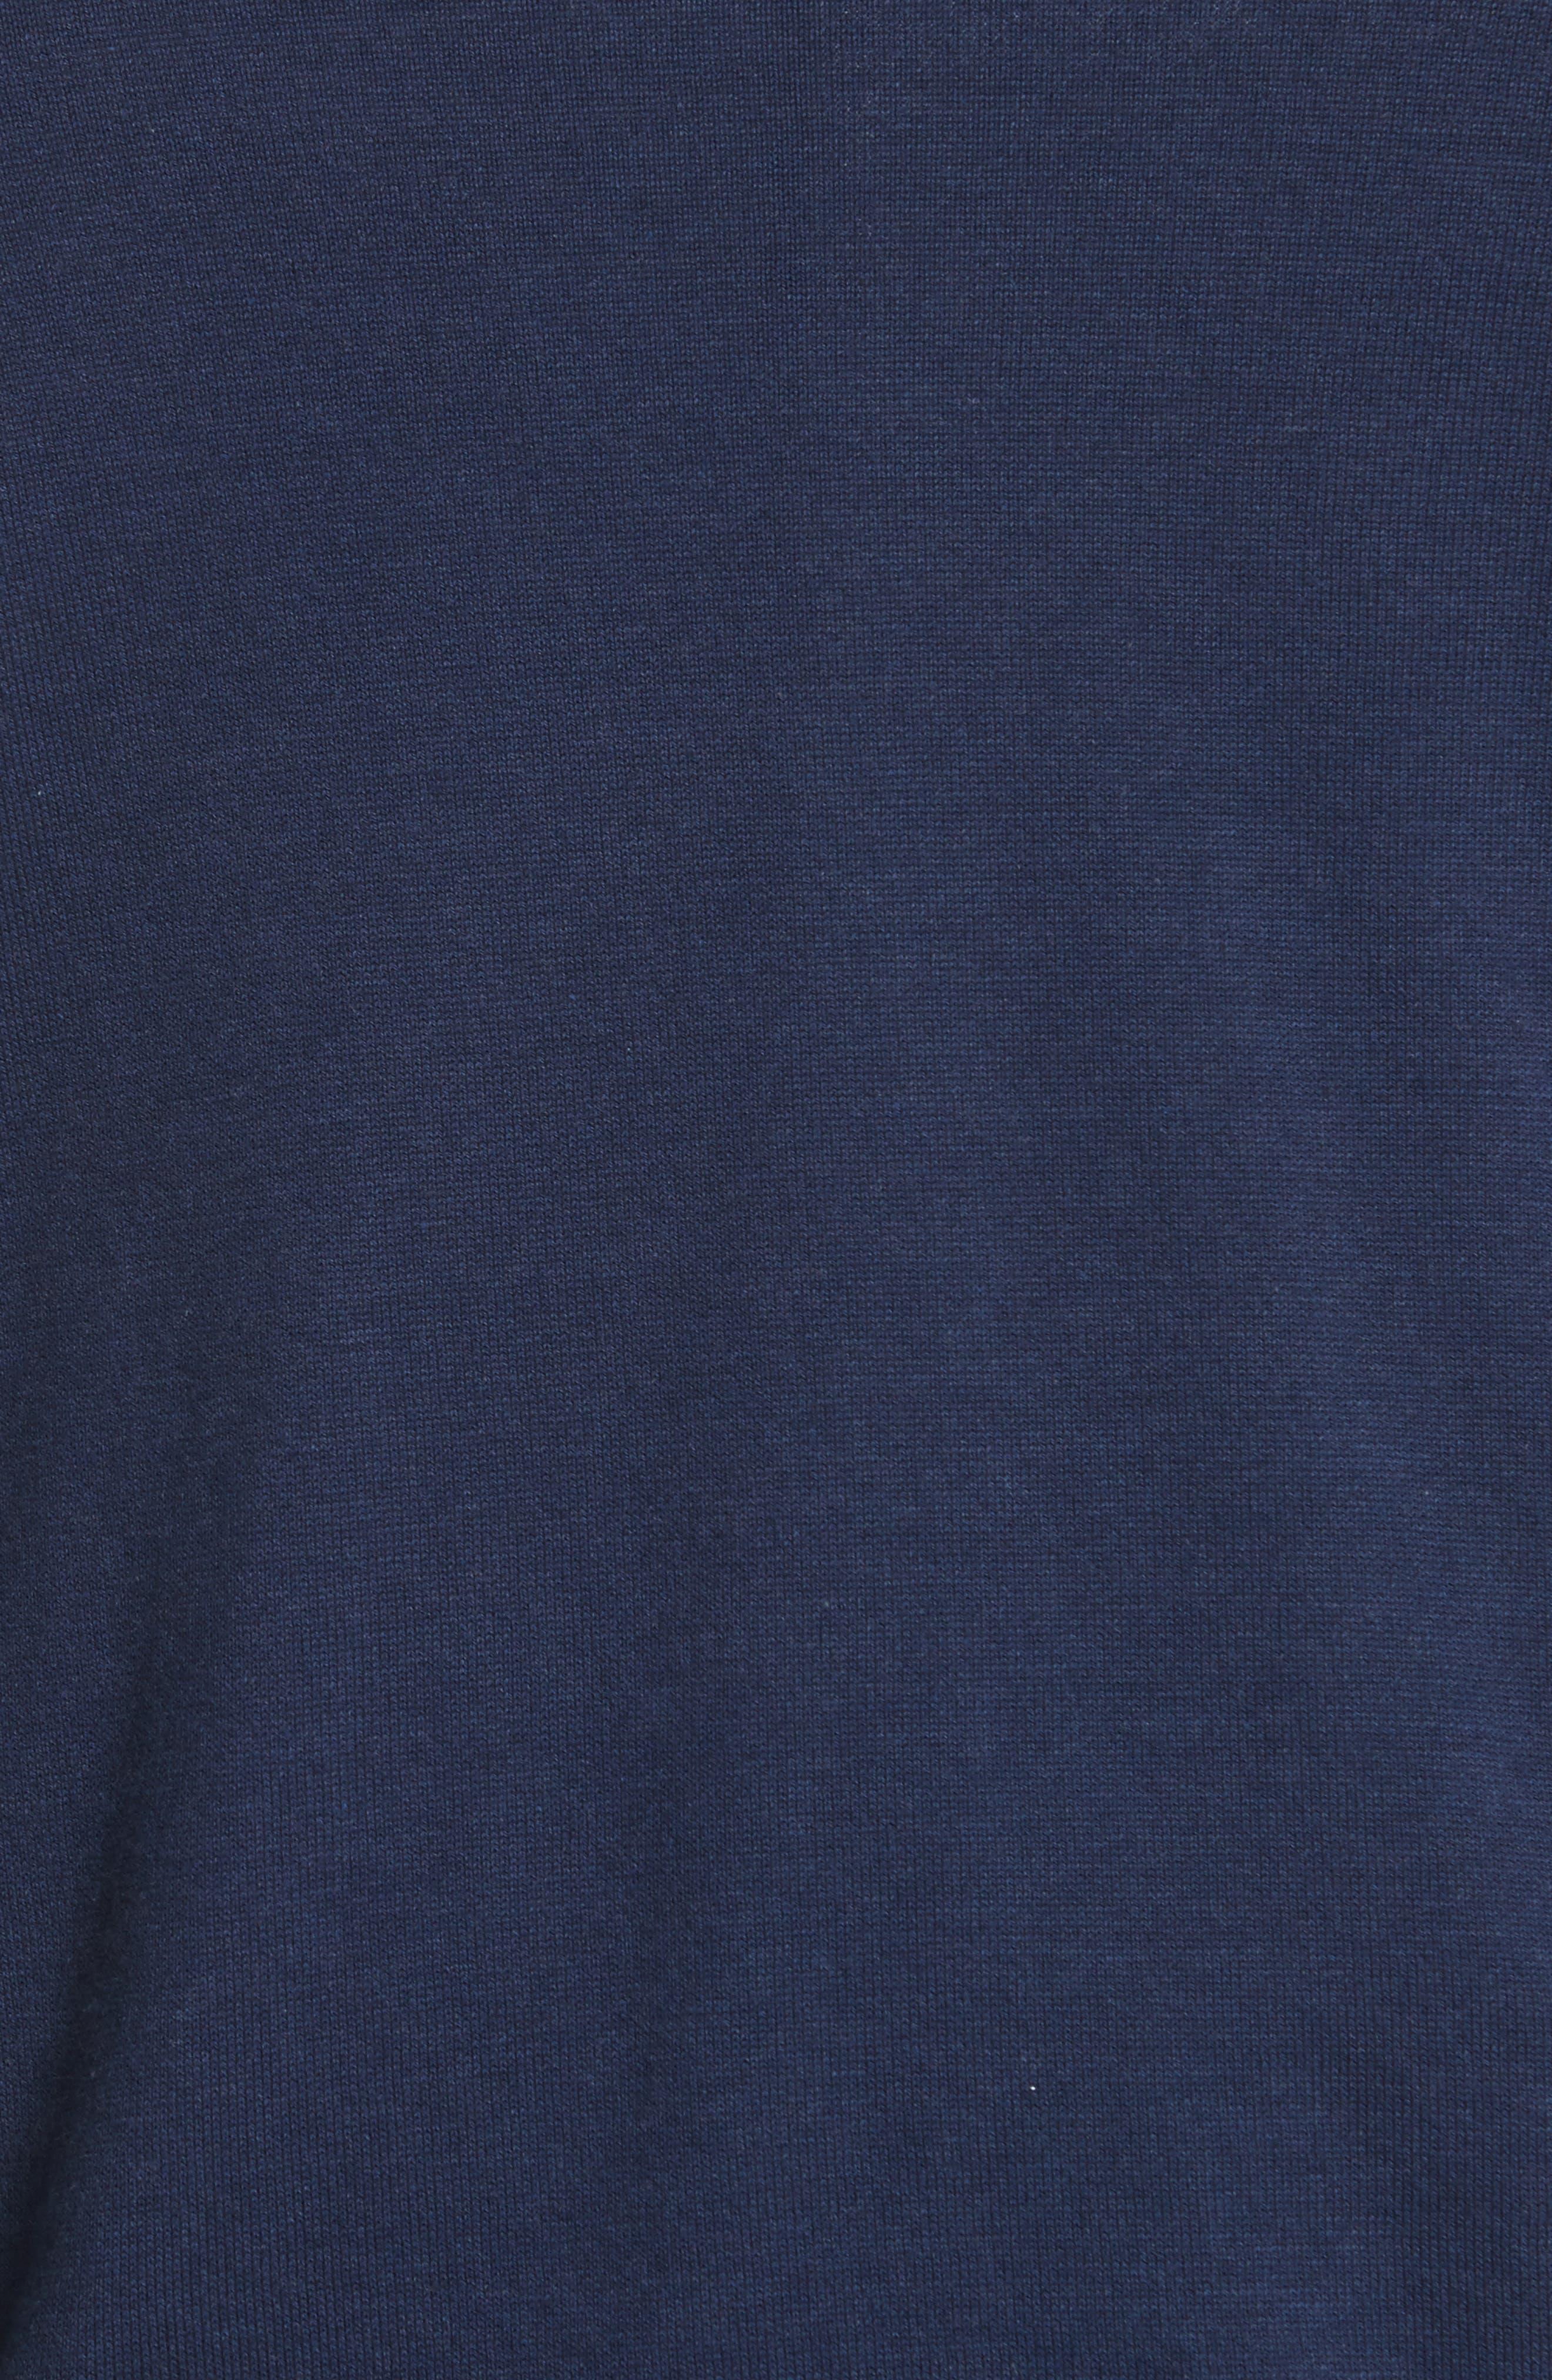 Quarter Zip Sweater,                             Alternate thumbnail 5, color,                             Dark Blue